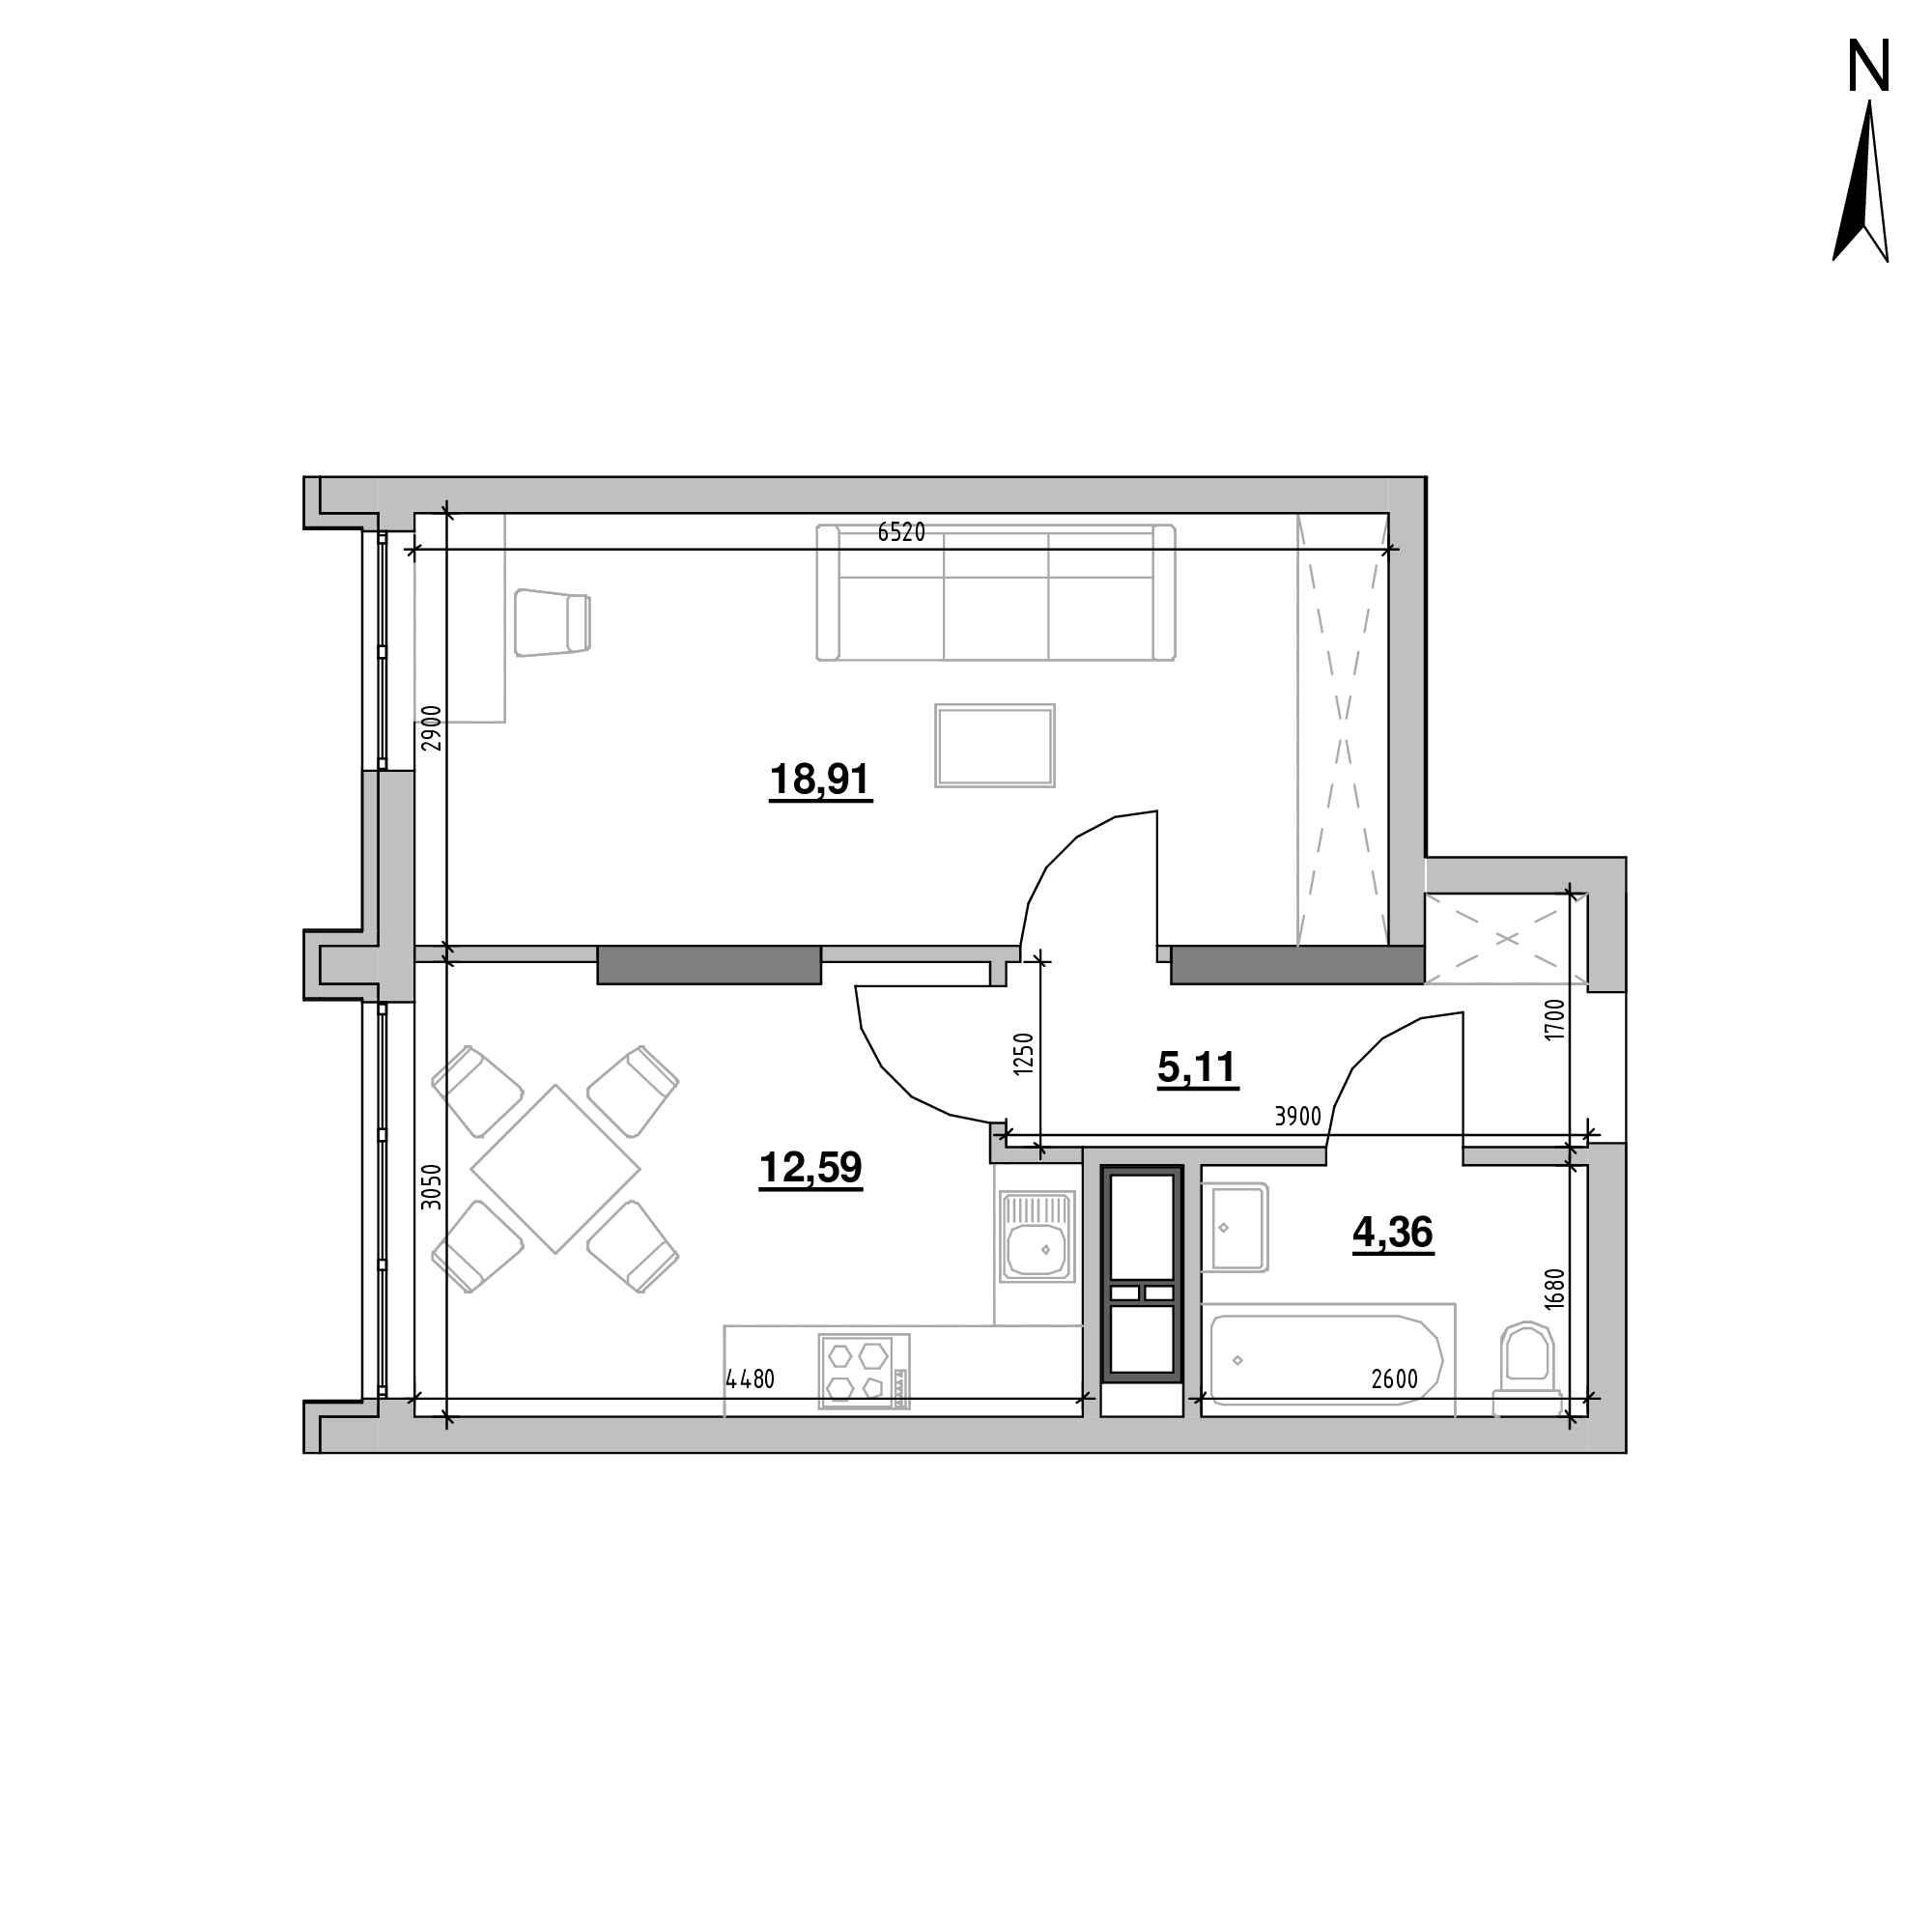 ЖК Nordica Residence: планування 1-кімнатної квартири, №43, 40.97 м<sup>2</sup>